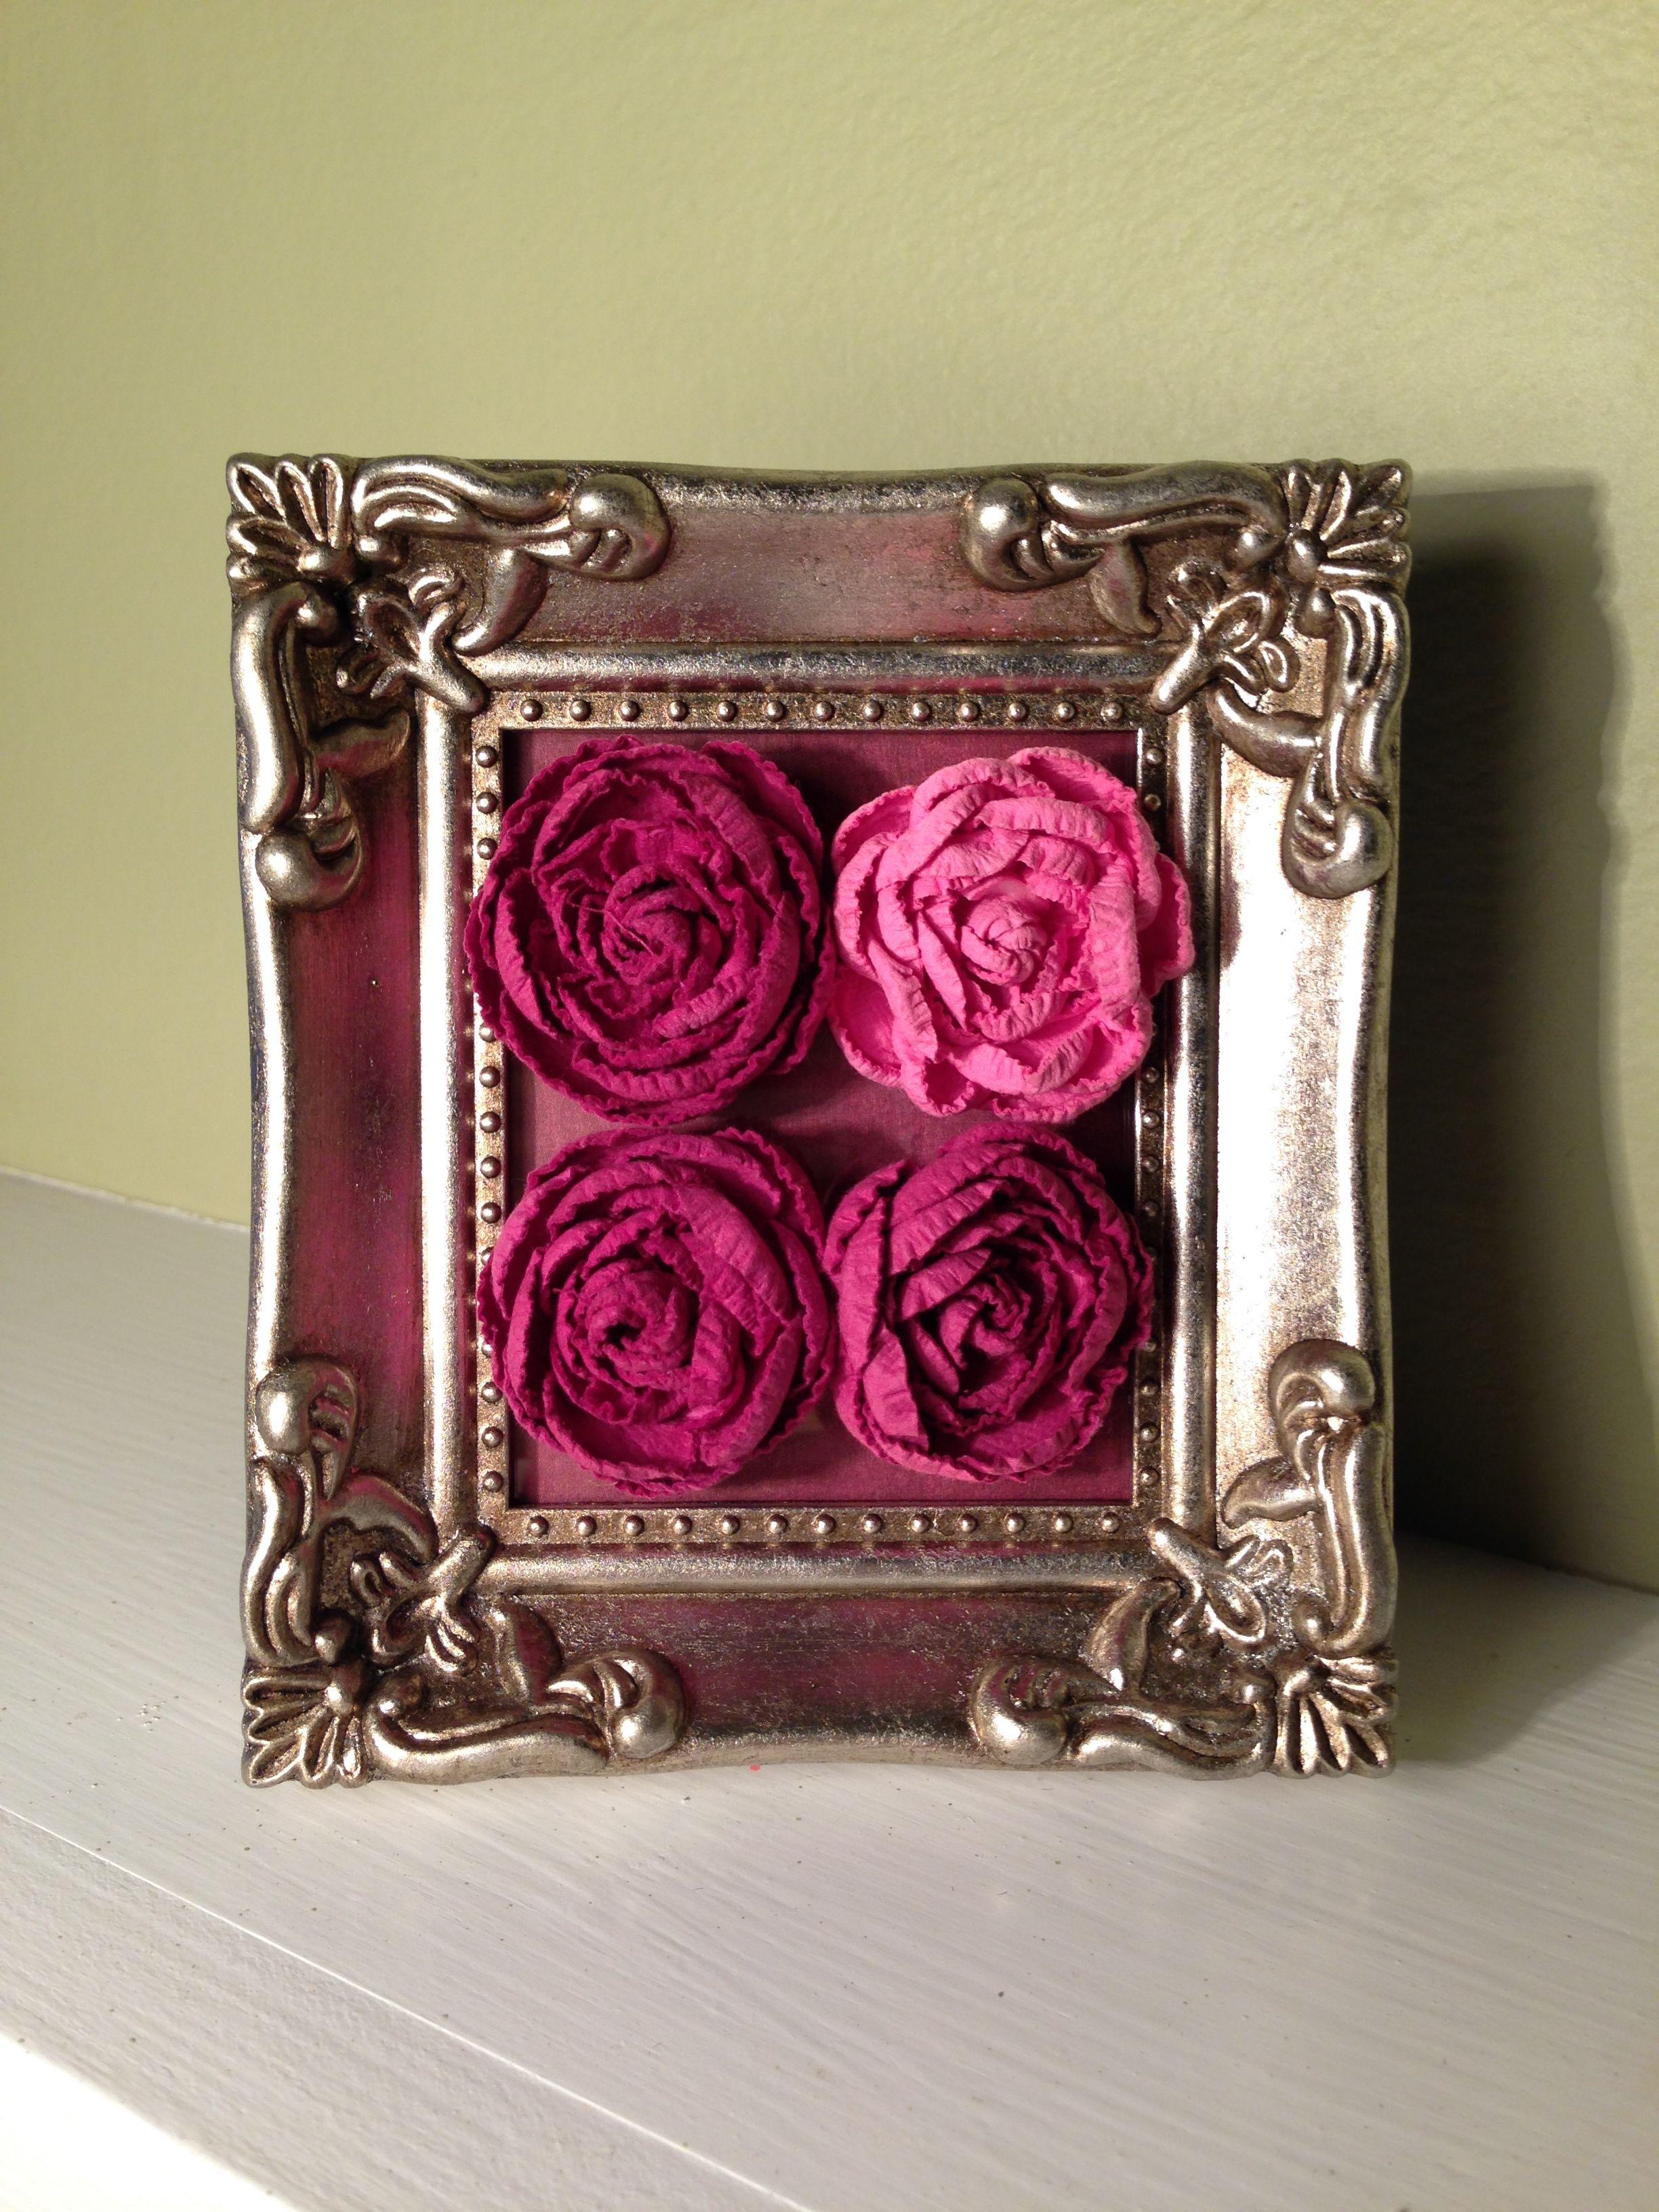 Paper roses in gold frame  The Telltale Home  Pinterest  Paper roses